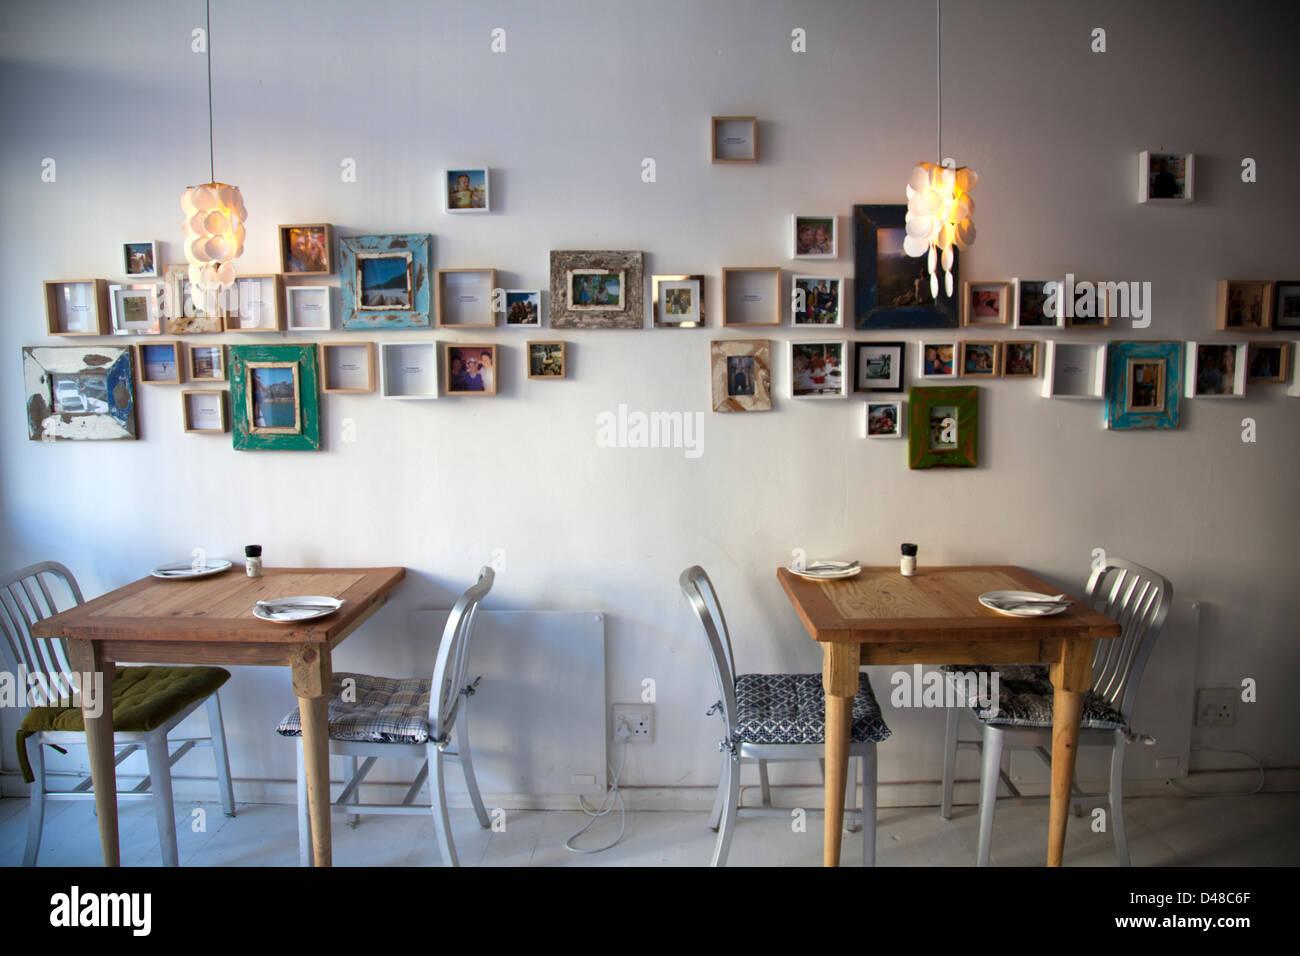 The Backyard Cape Town backyard restaurant interior style in stock photos & backyard